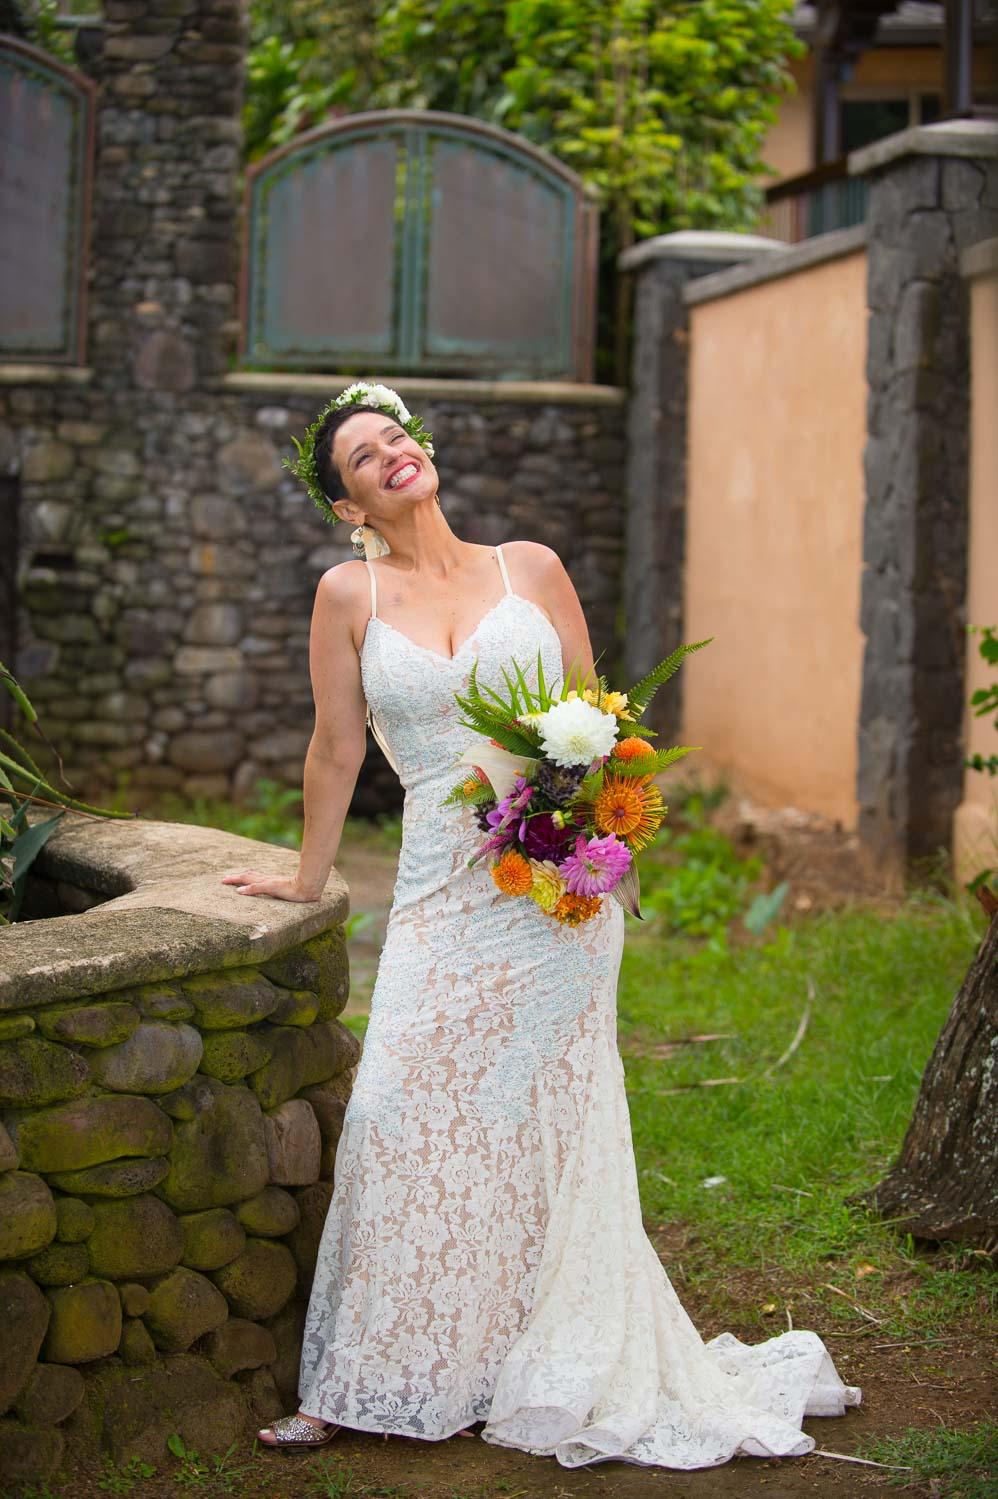 maui-wedding-photography-maui-wedding-venue-Tad-Craig-Photography-48.jpg